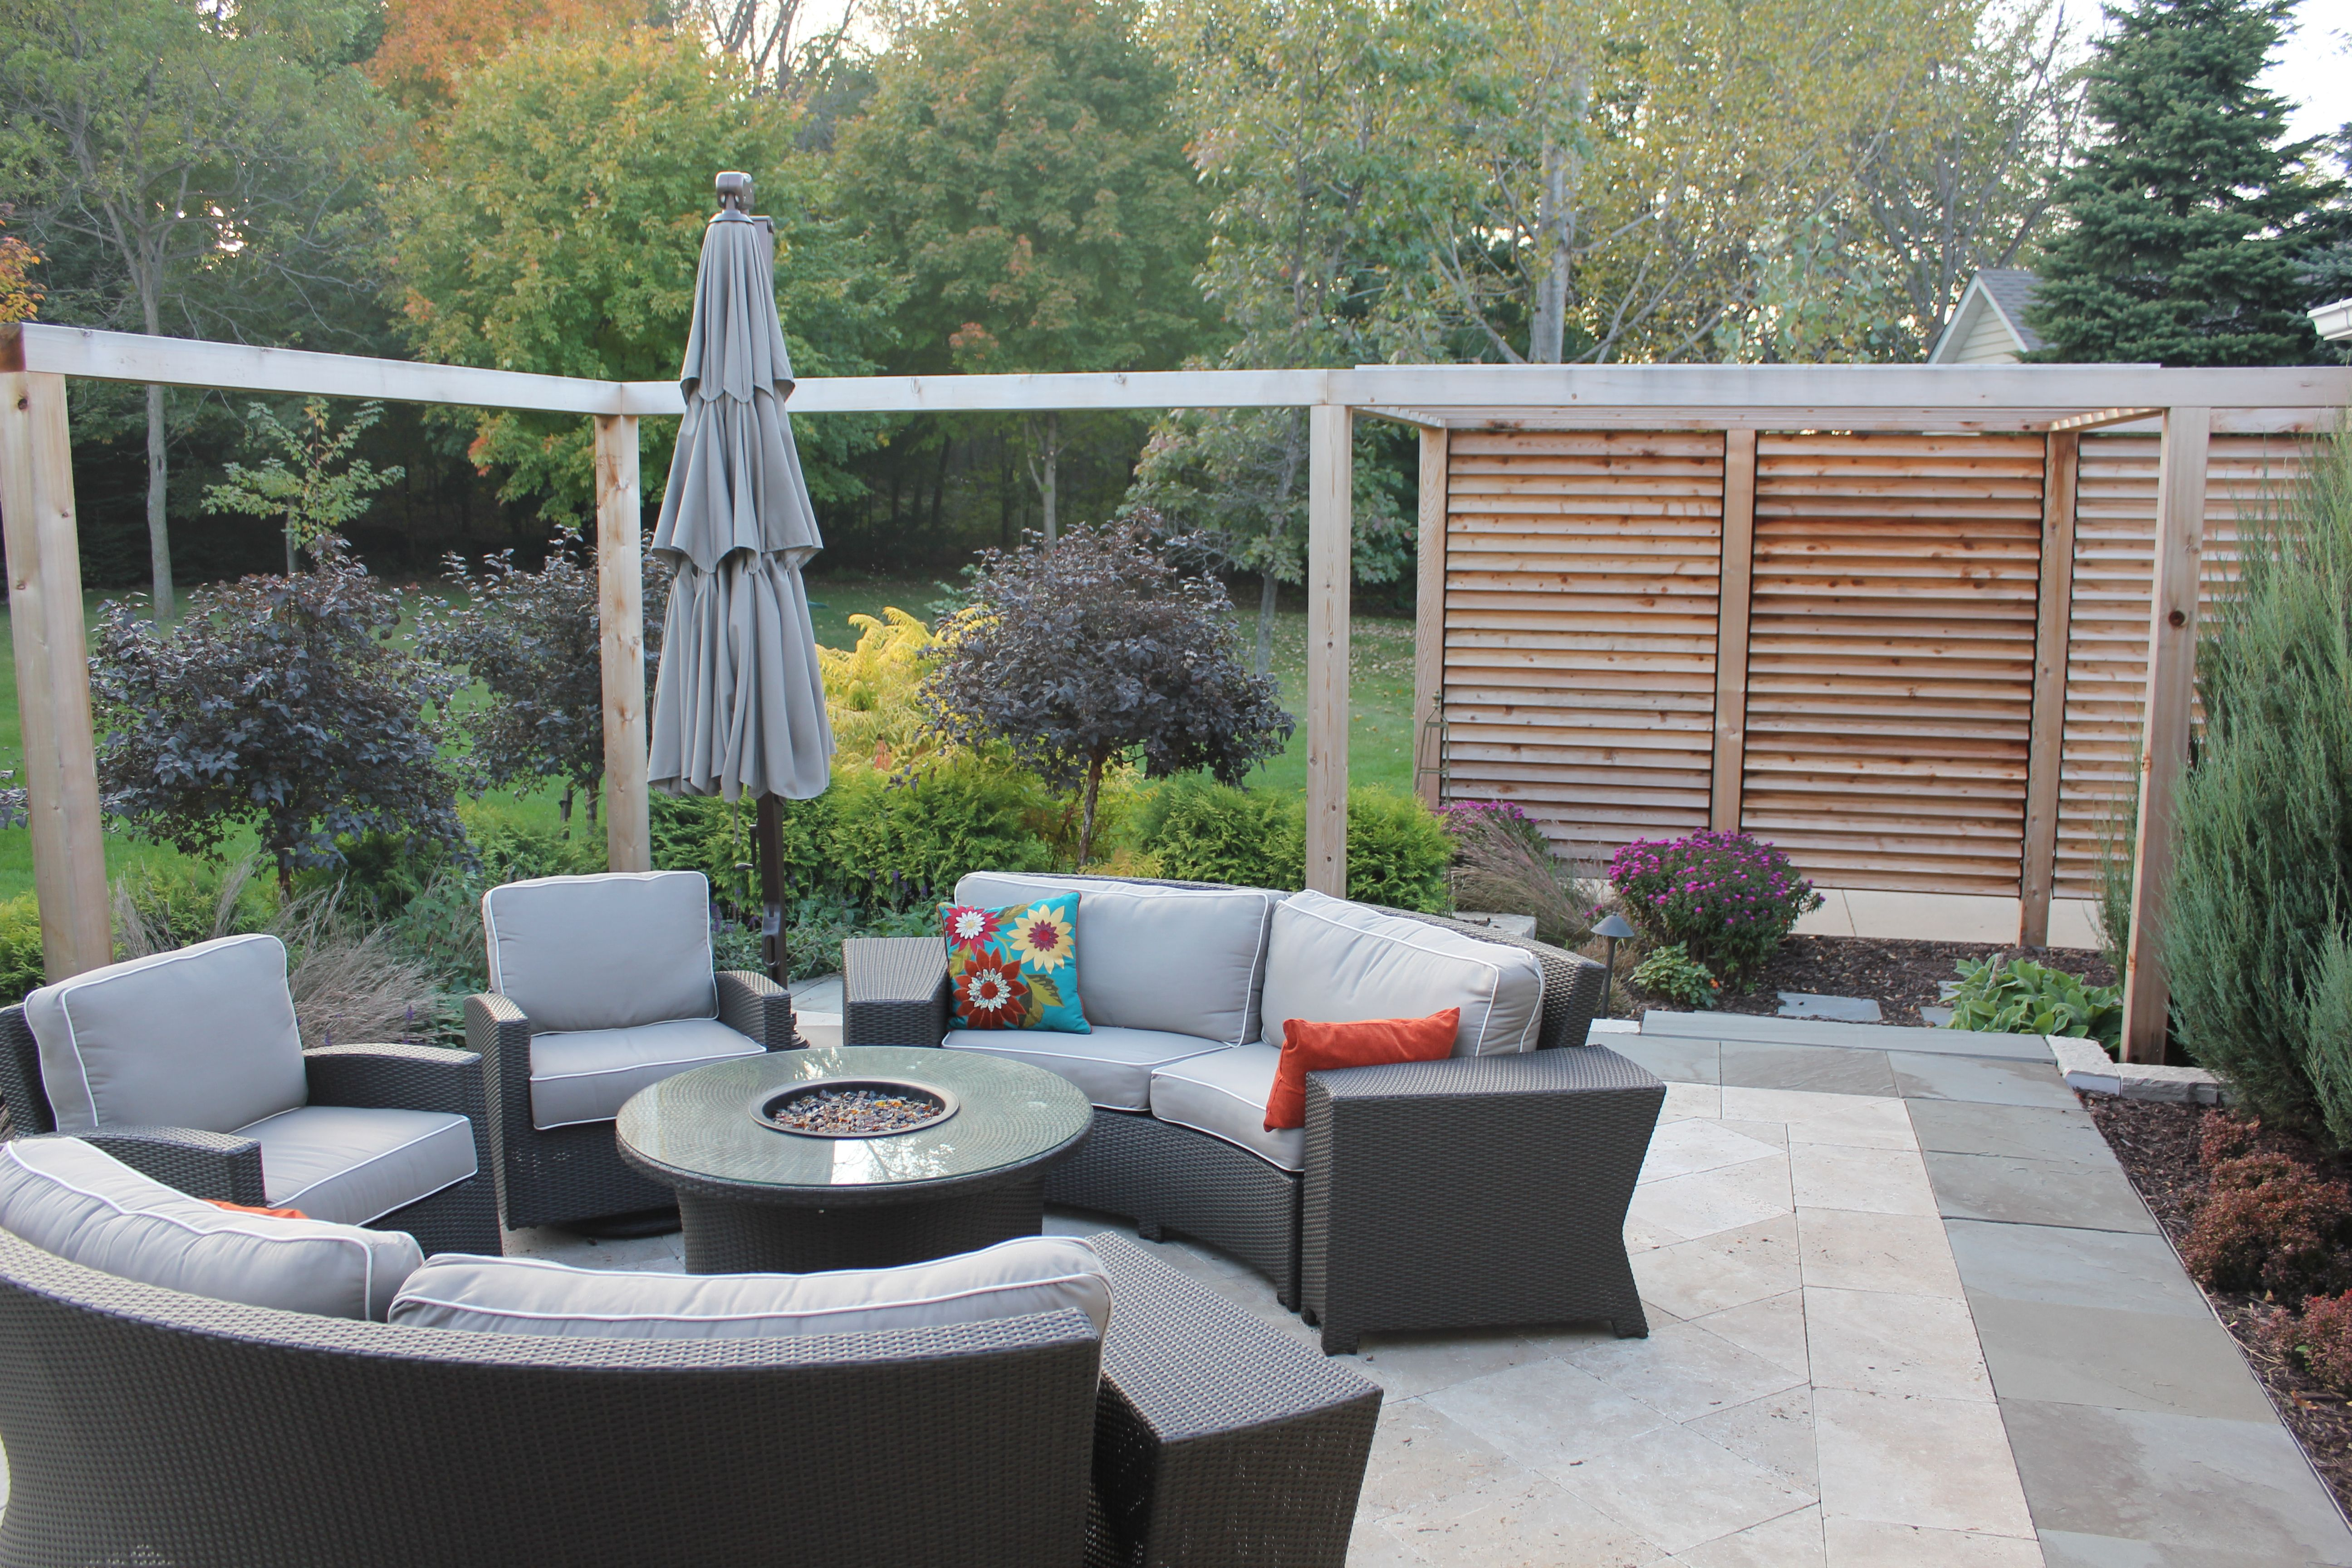 Louvered Garden Privacy Wall | Creative Backyard Fence Ideas | Pinterest |  Garden Privacy, Privacy Walls And Backyard Fences